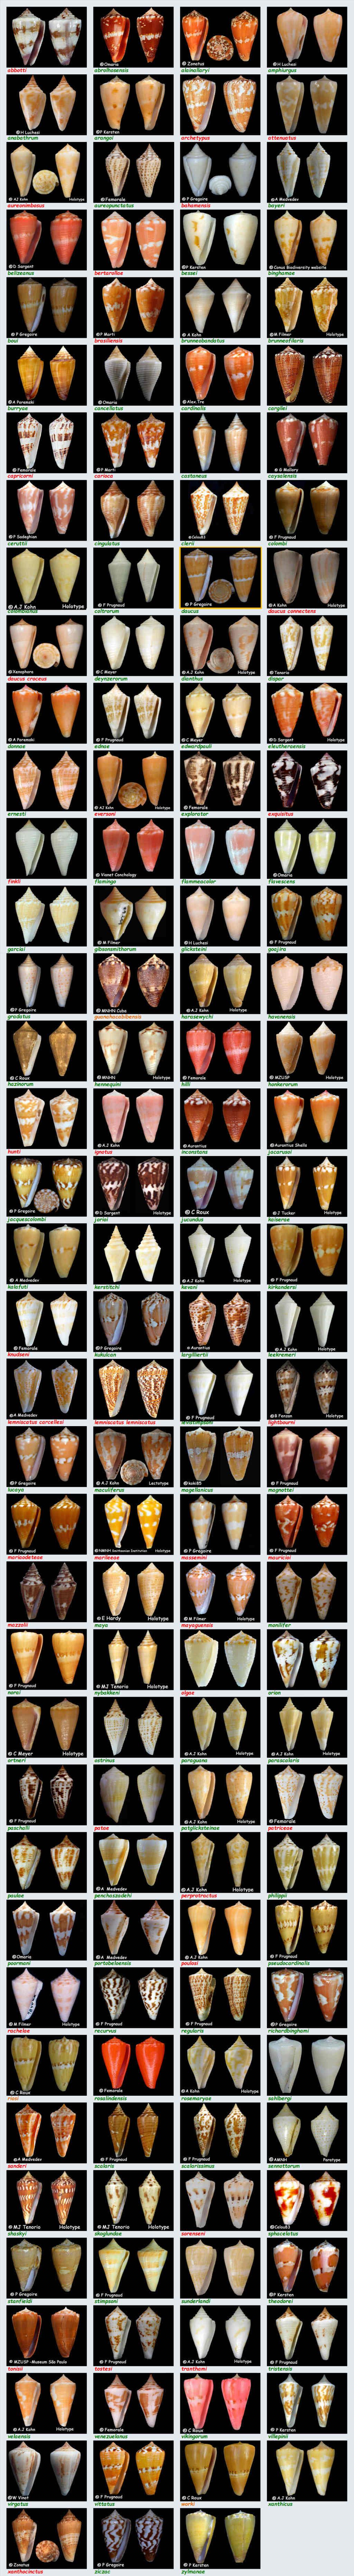 Conidae Conus (Dauciconus) - Le genre, ses espèces, la planche Conus_28